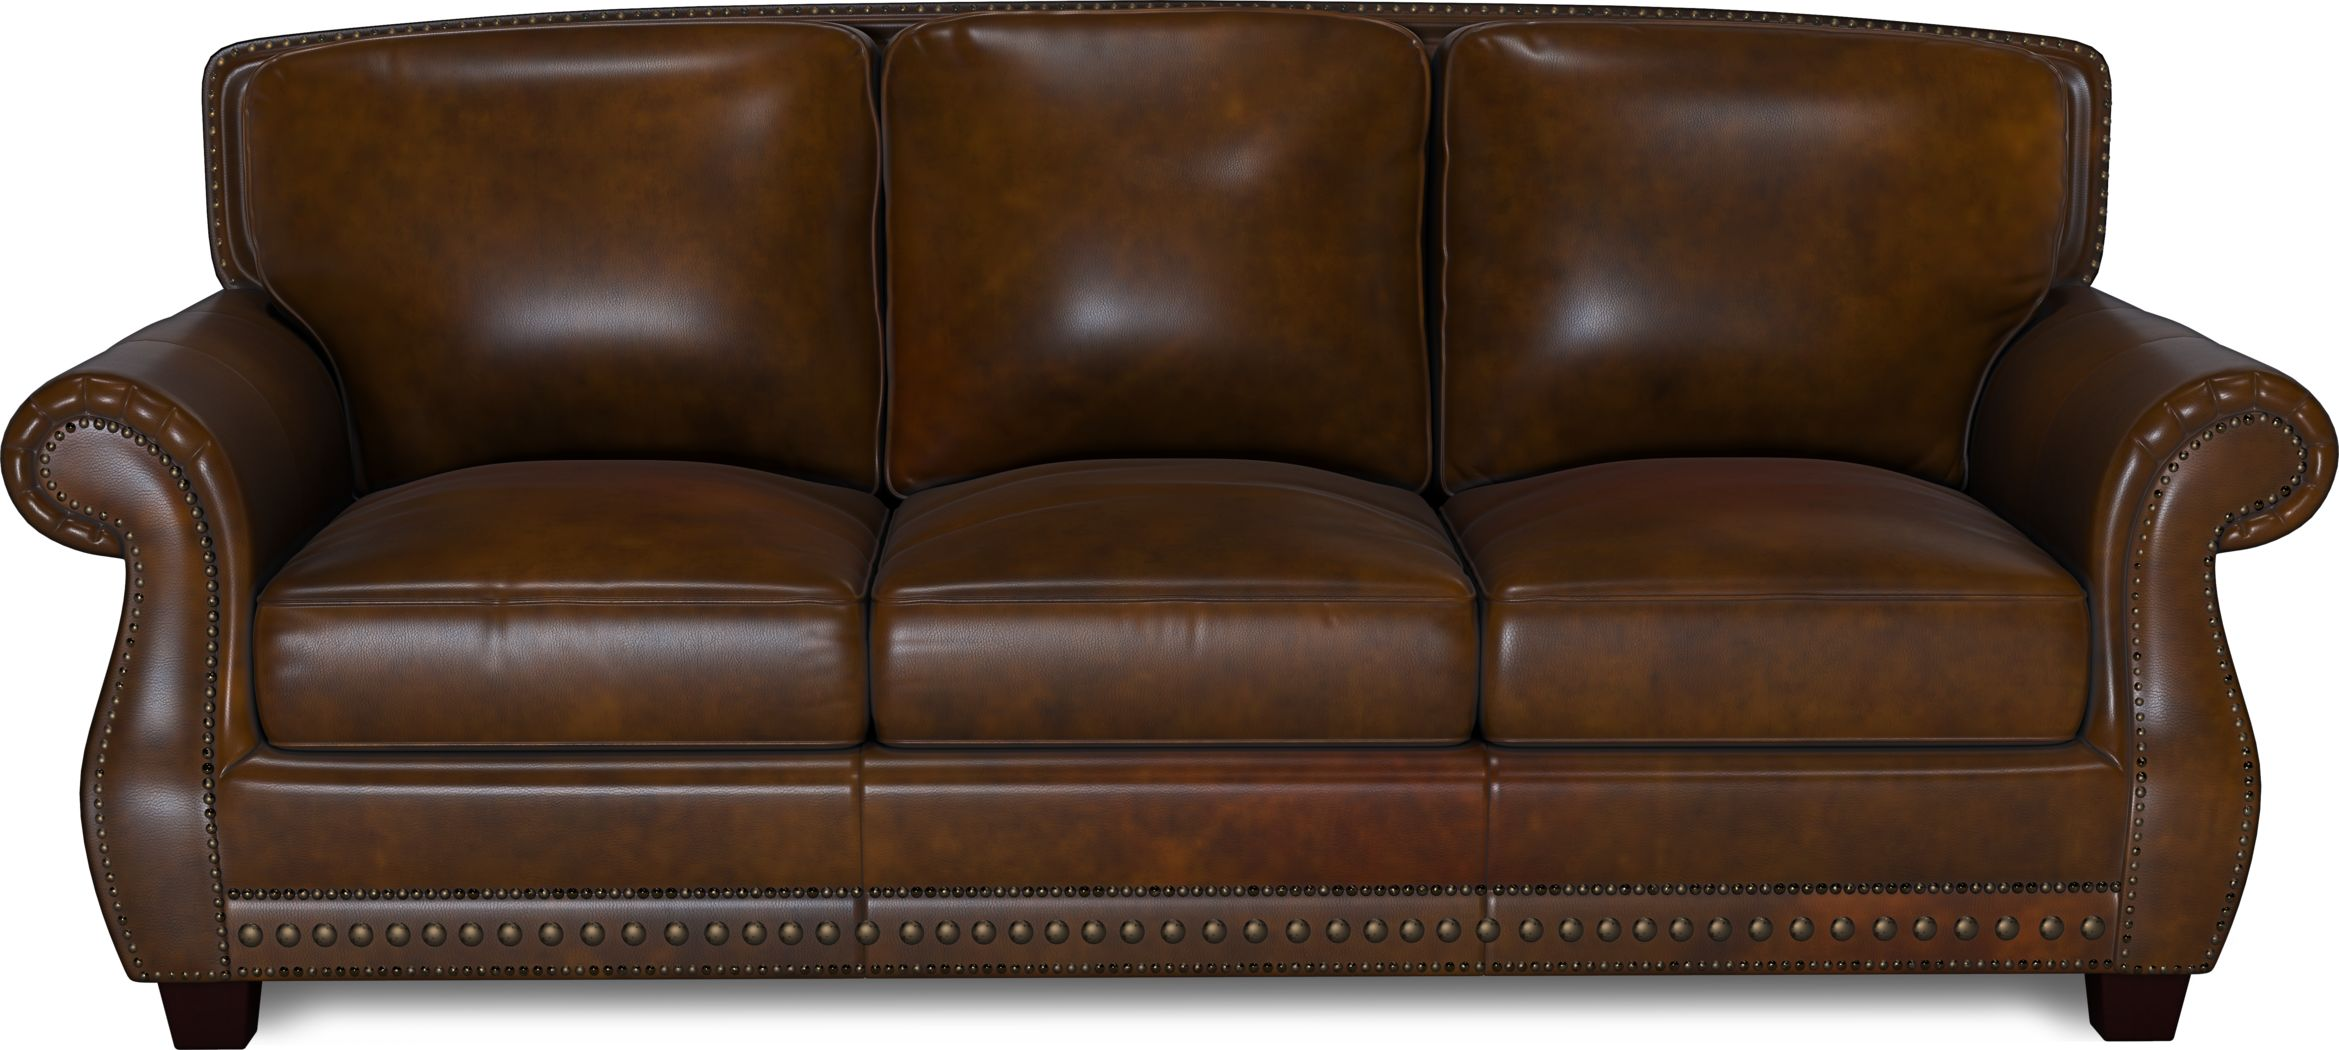 Cindy Crawford Home Calvano Brown Leather Gel Foam Sleeper